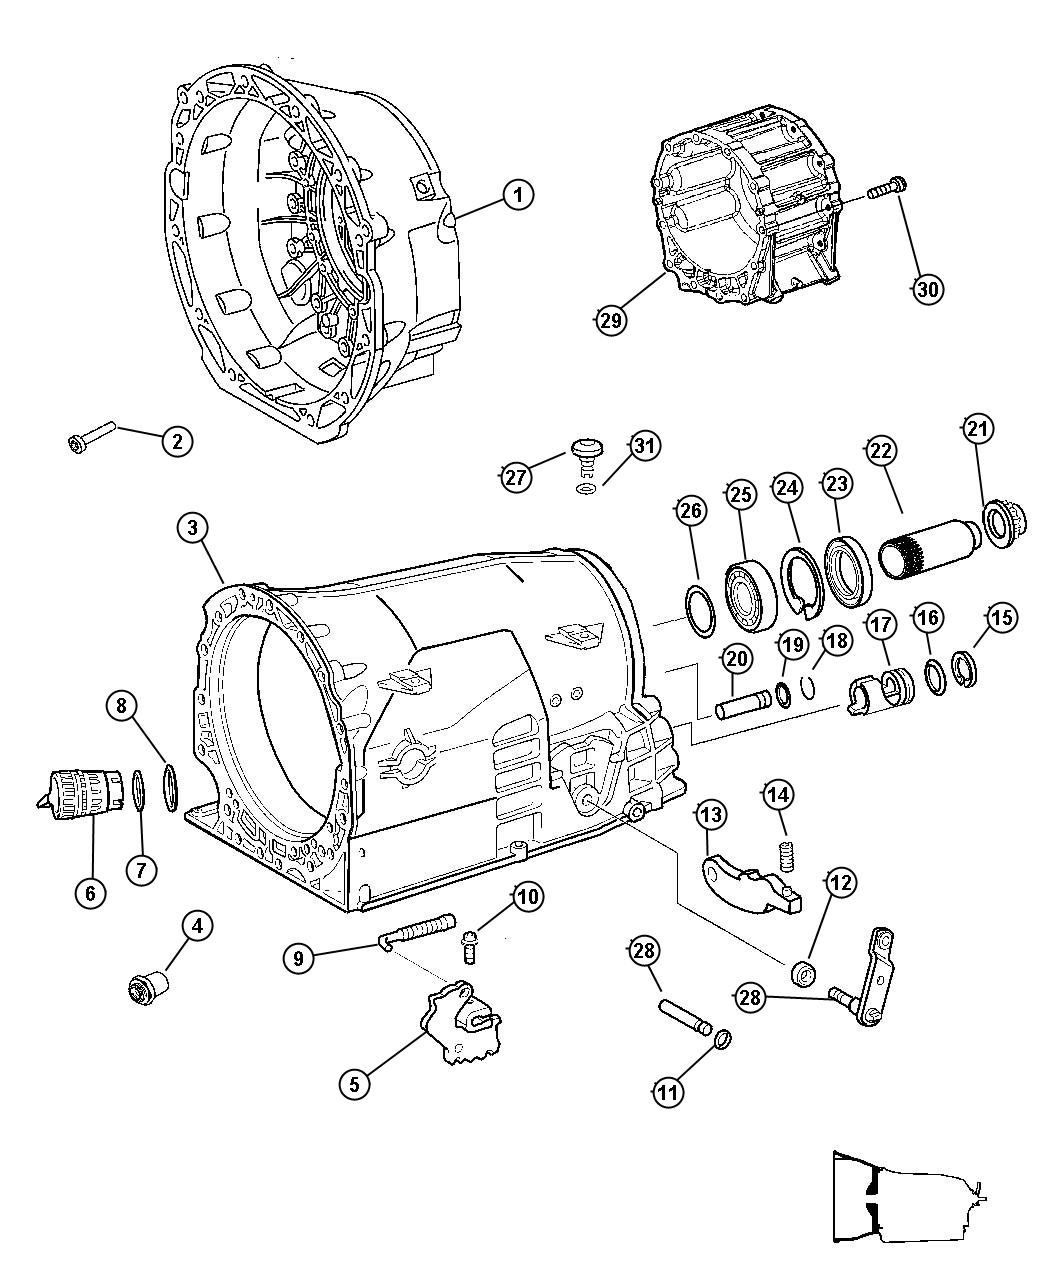 Jeep Grand Cherokee Flange package, shaft package